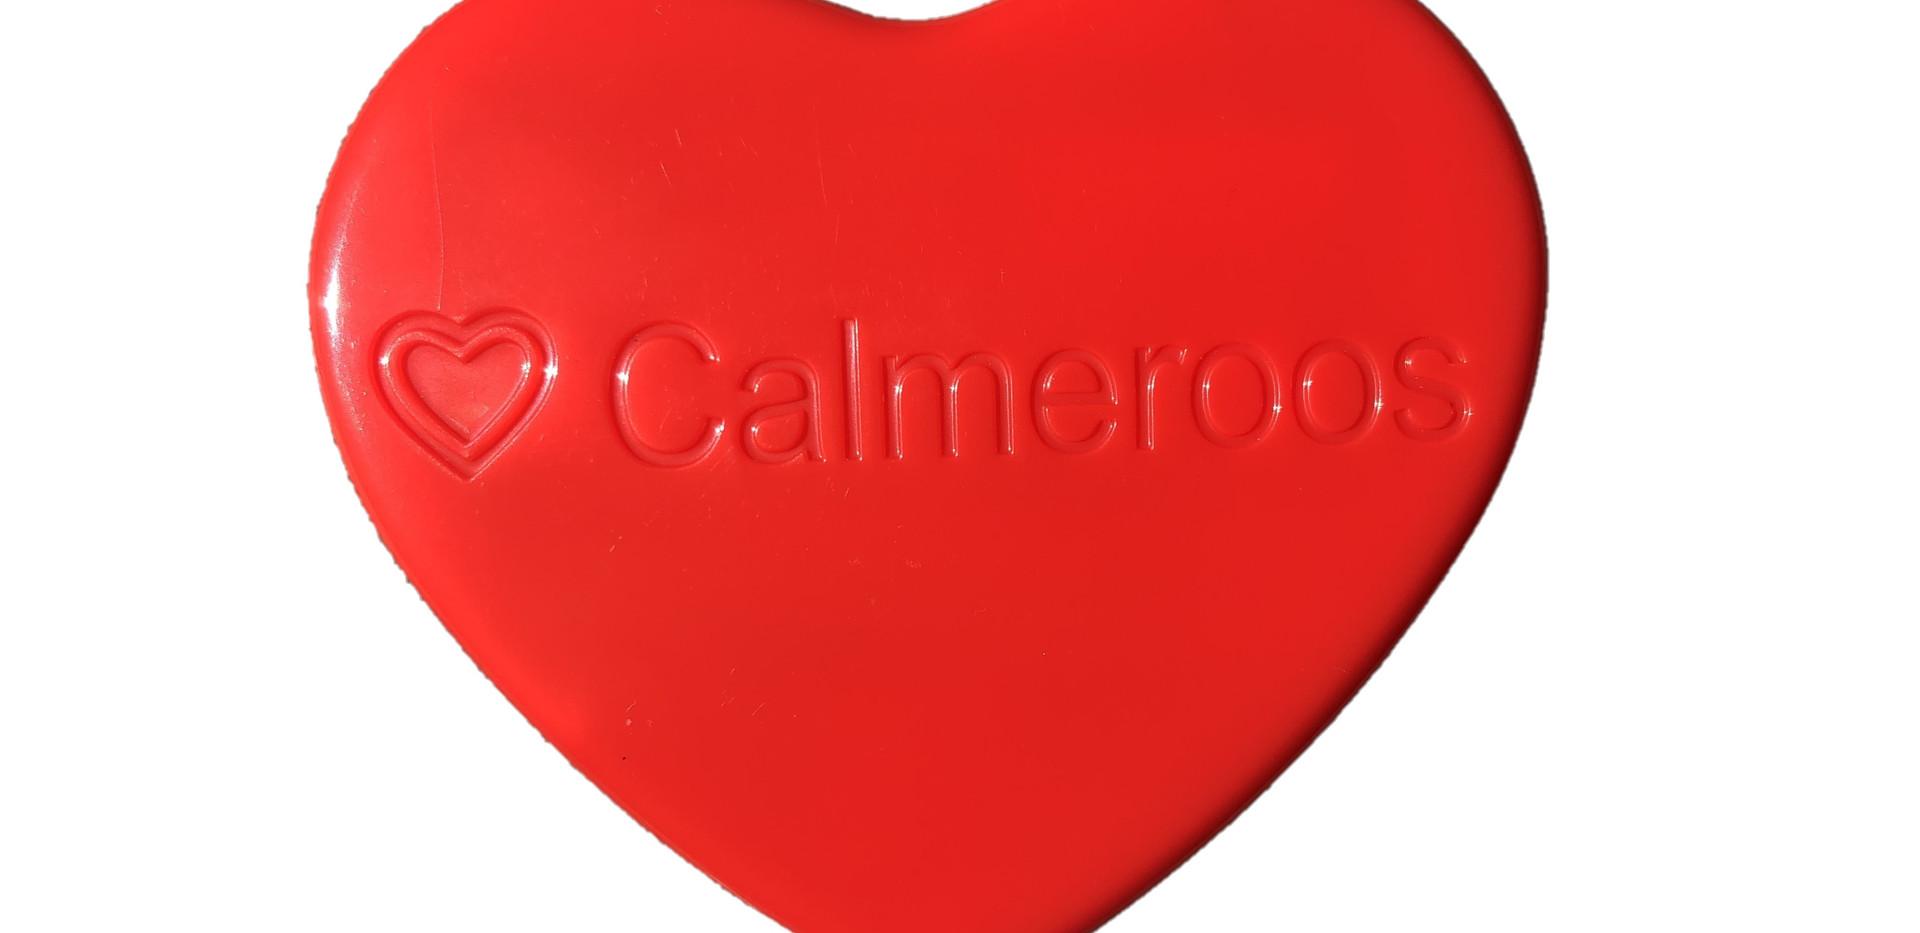 Calmeroos heart